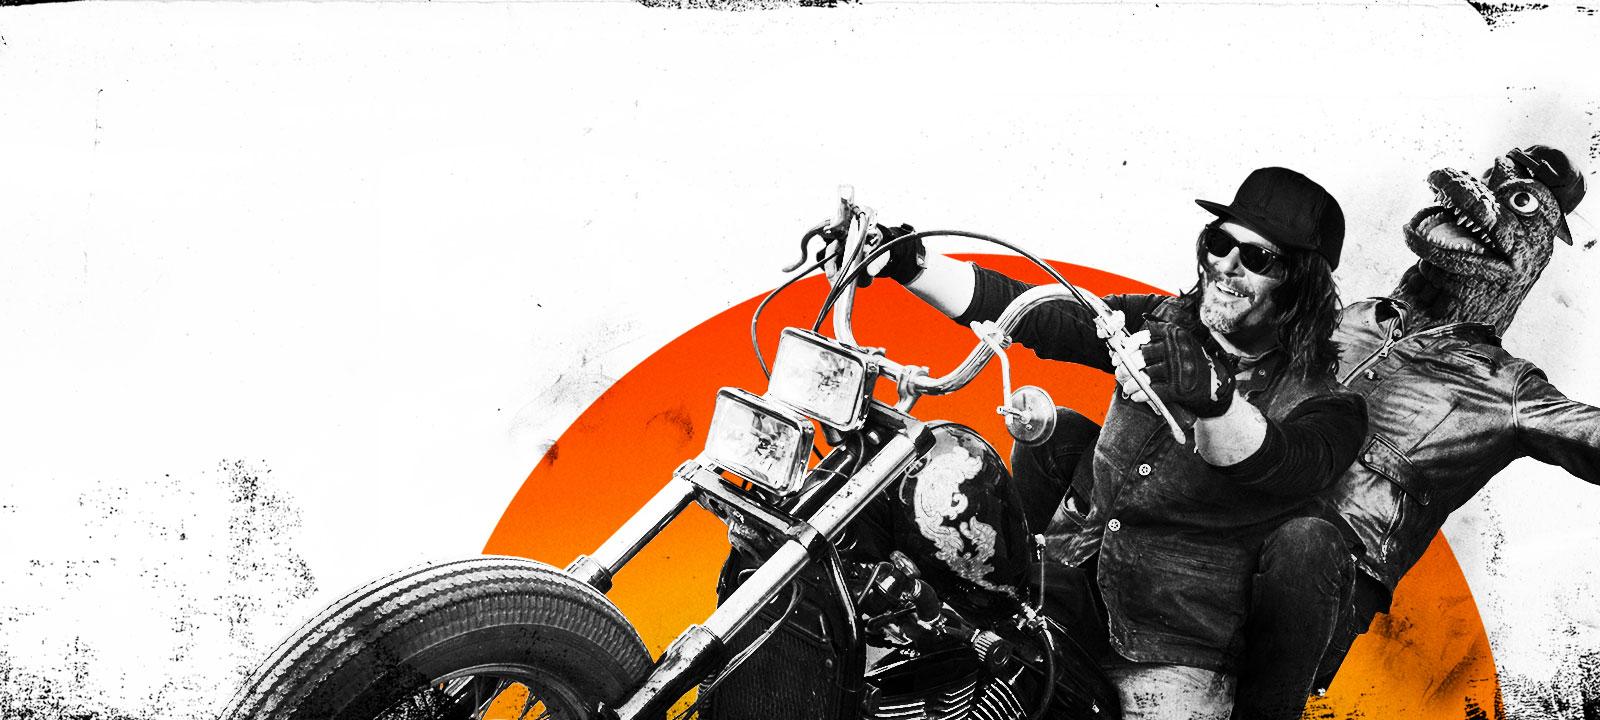 ride-with-norman-reedus-S3-key-art-800x600_MobileWeb_HomeHero_F